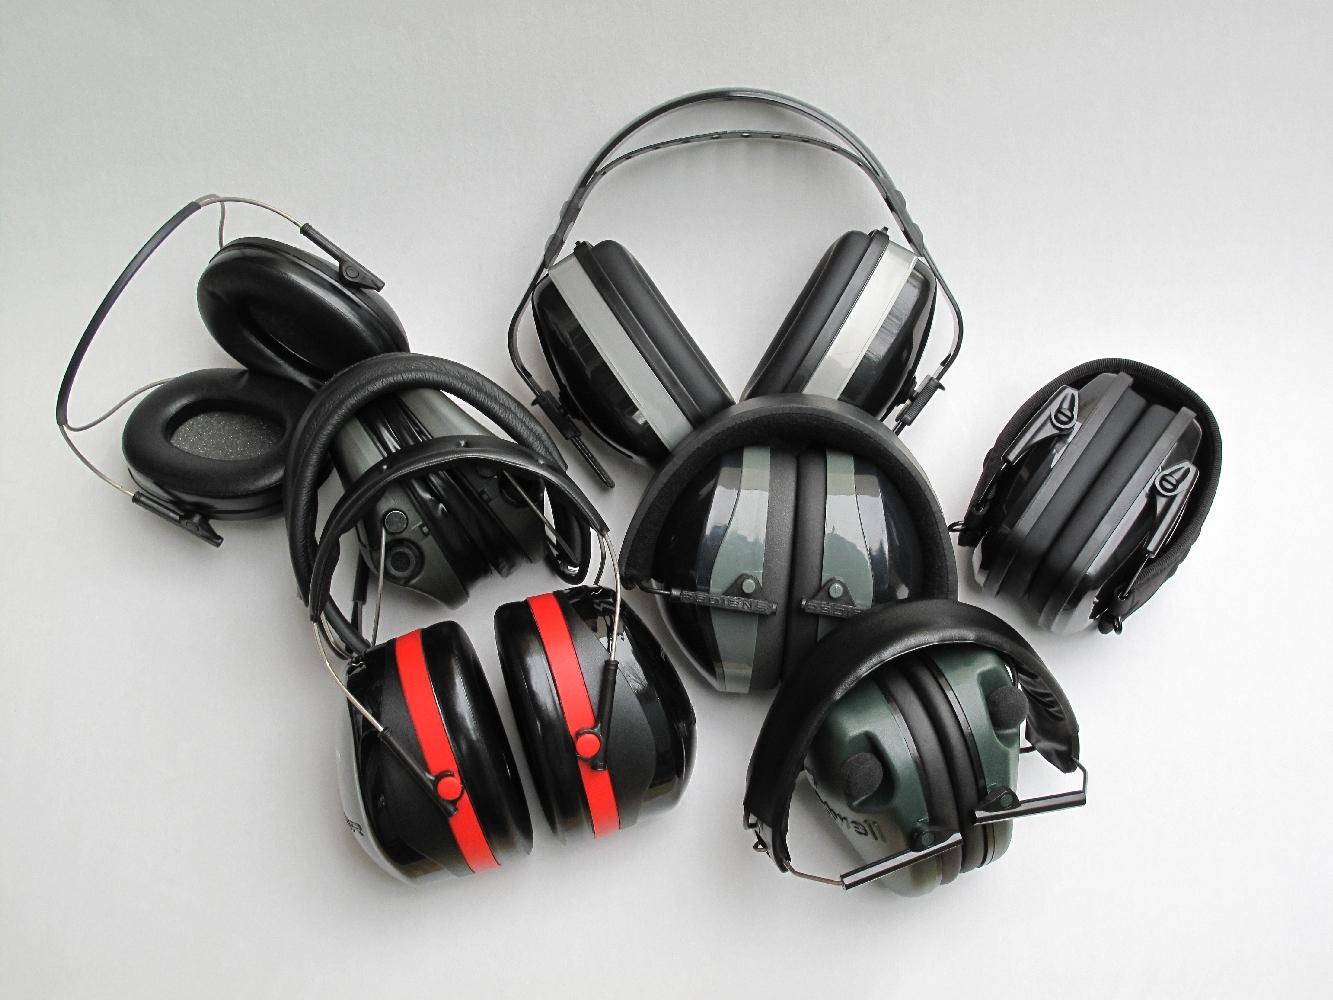 essai armes les protections auditives. Black Bedroom Furniture Sets. Home Design Ideas